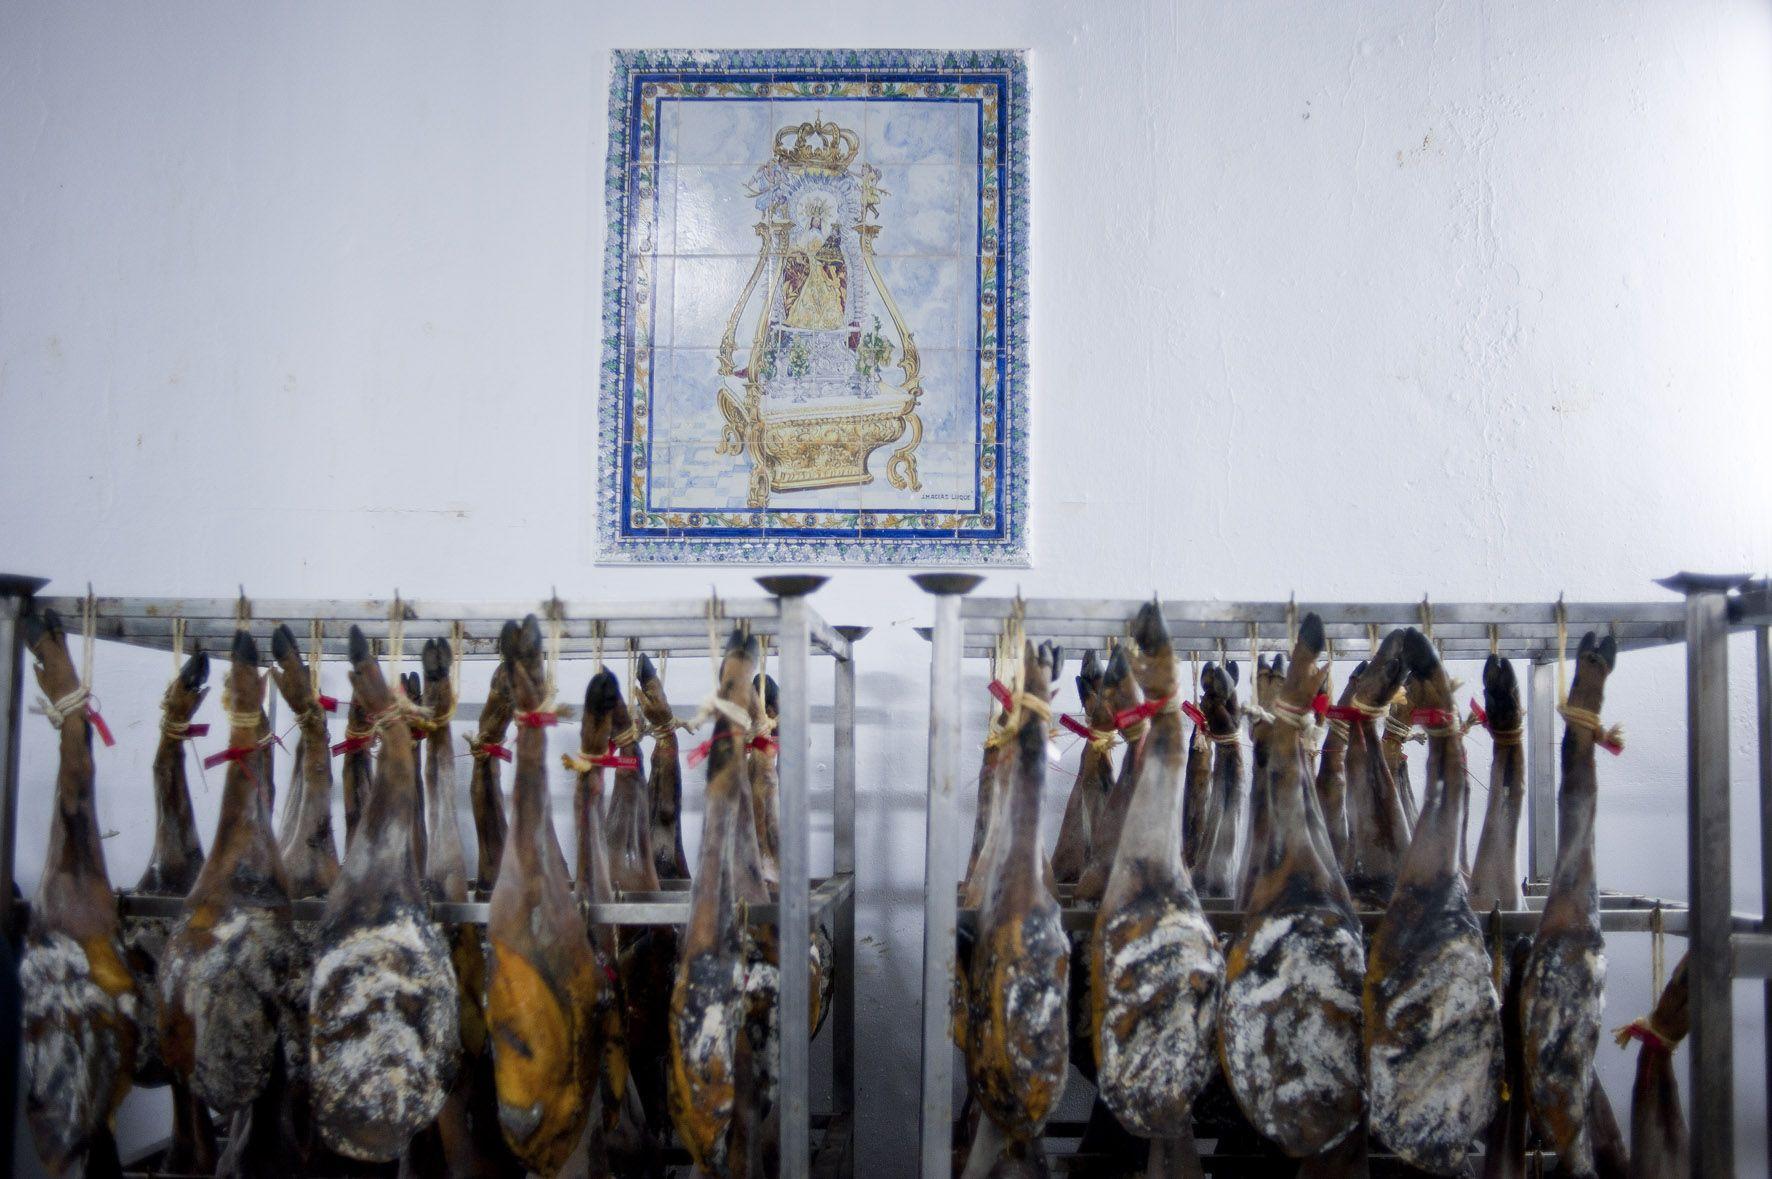 Secadero de jamones ibericos de Fregenal de la sierra